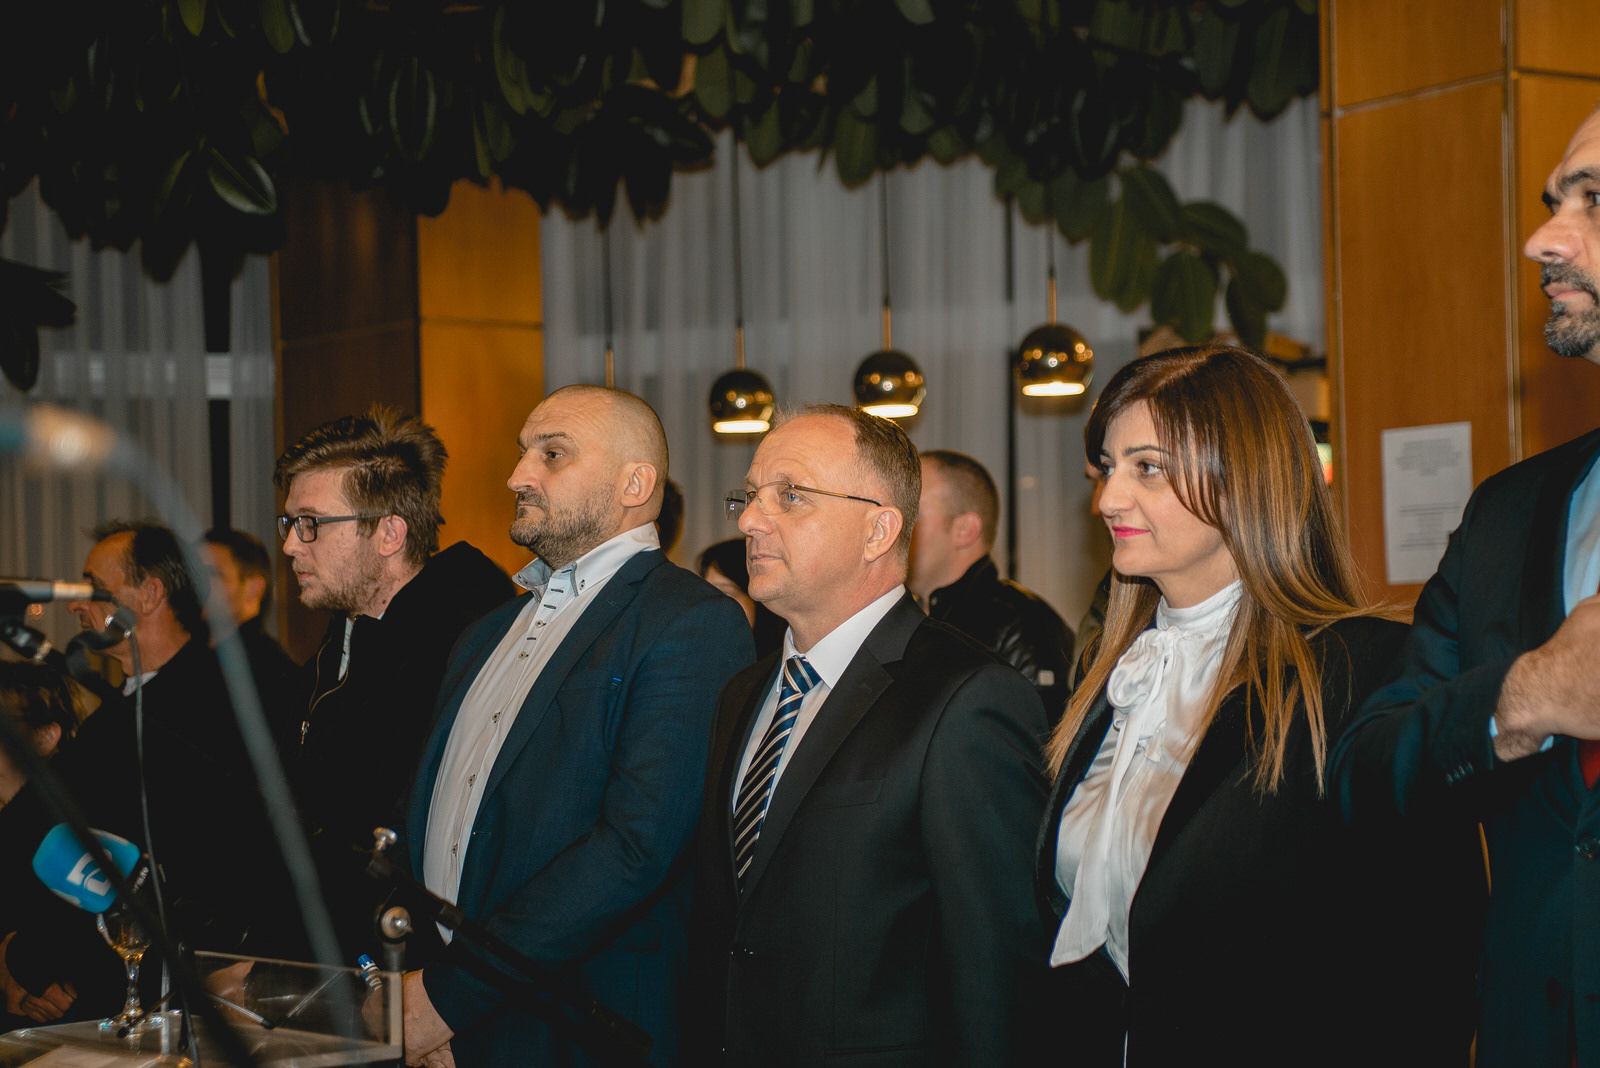 likaclub_bura-promjena_novalja_2019-2